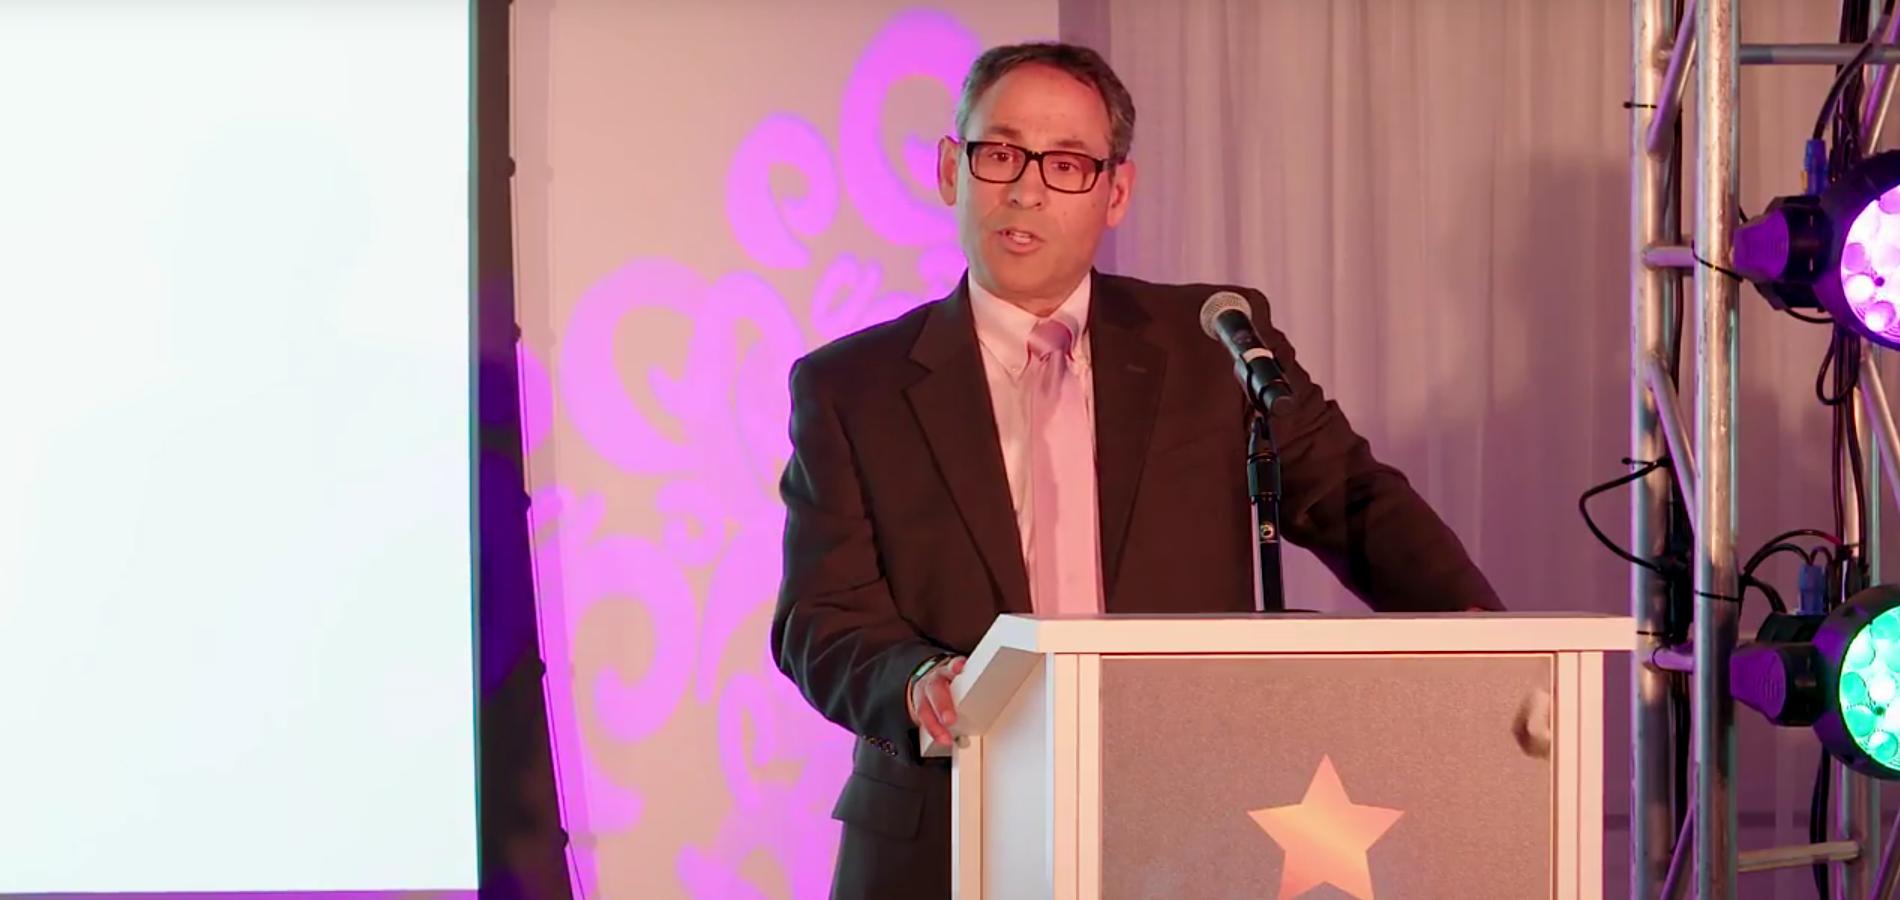 CFO Mobility, Ford Motor Co, Neil Schloss, Accepts All Star Award